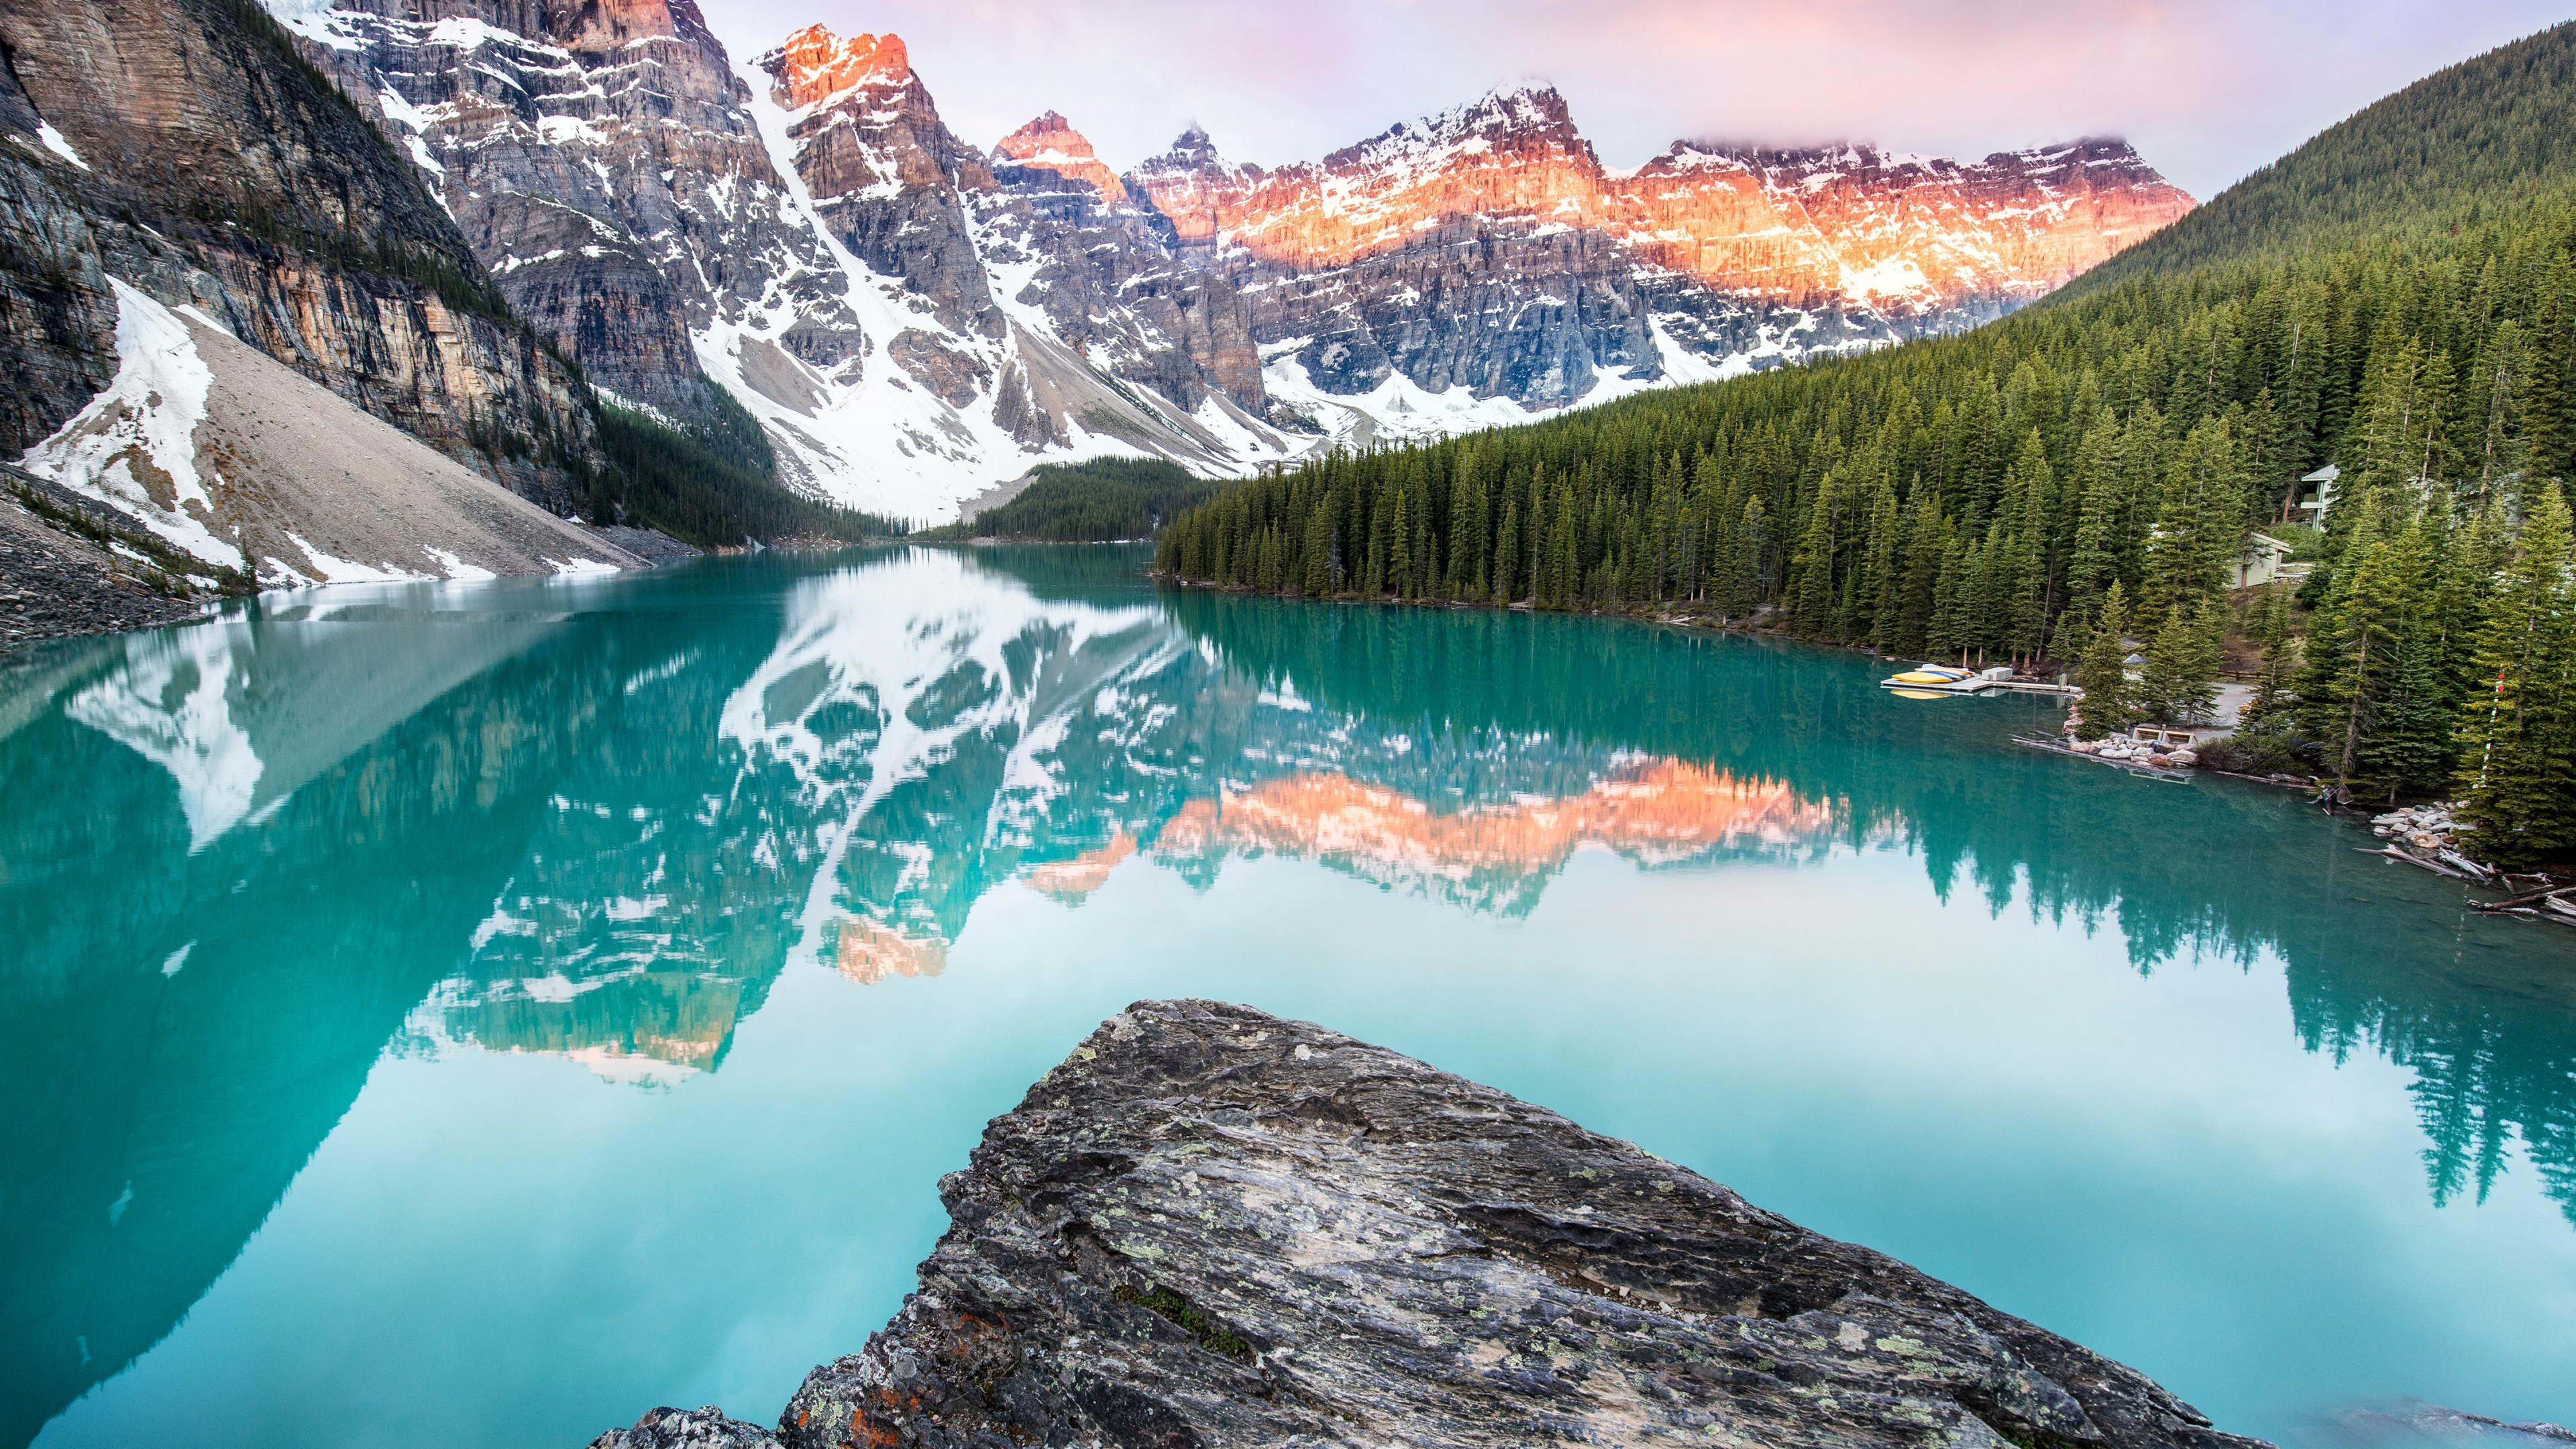 4k Wallpaper: Wallpaper Moraine Lake, Banff, Canada, Mountains, Forest